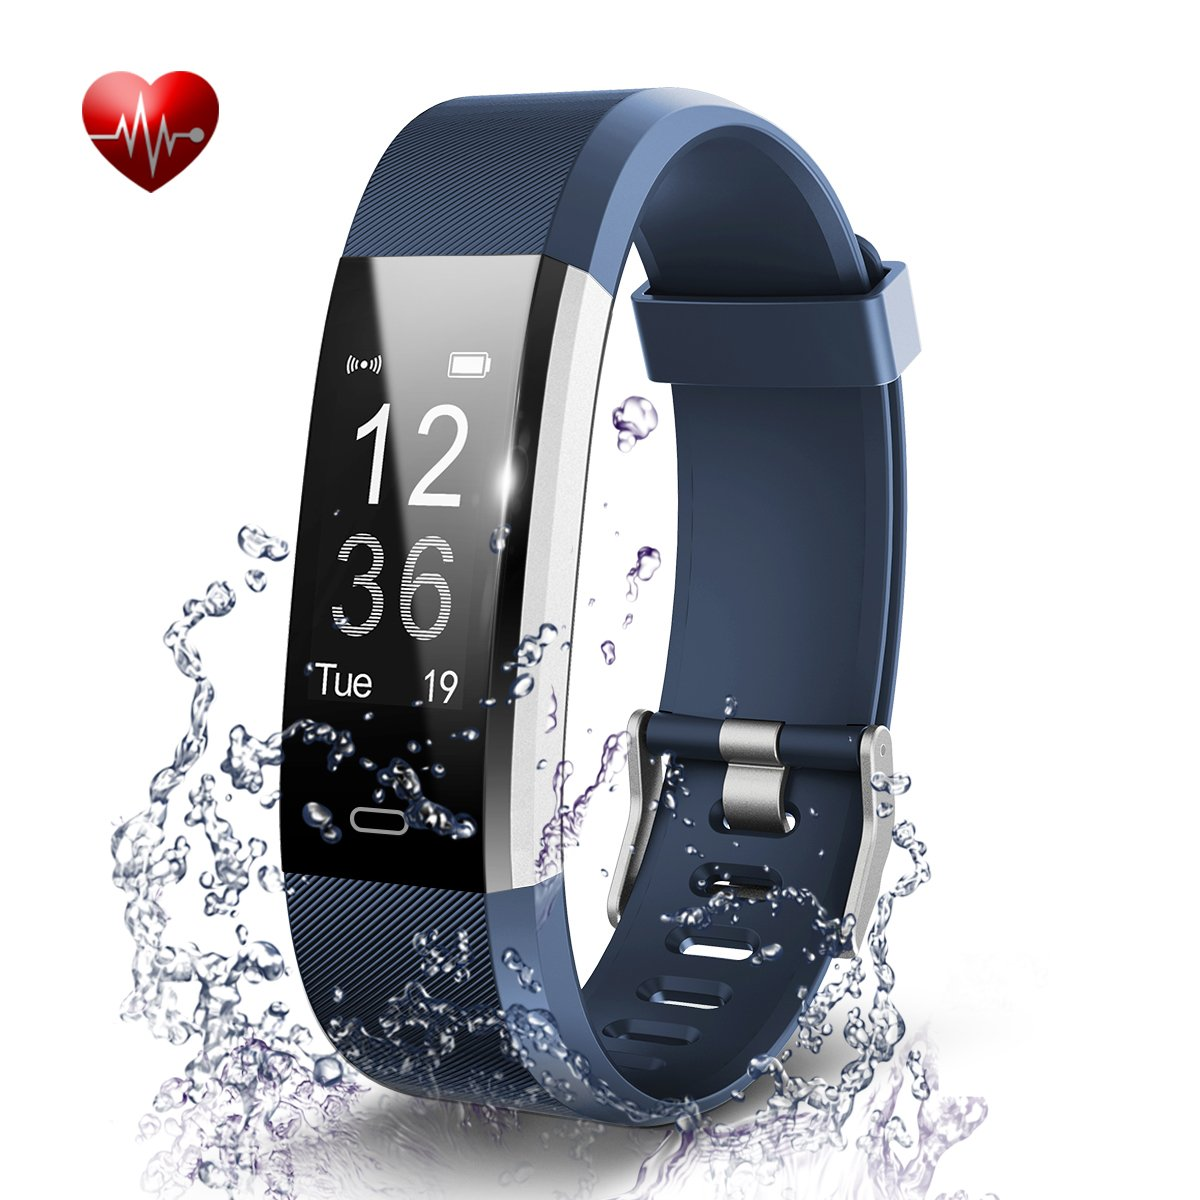 BADIQI Fitness Tracker- Waterproof Activity Tracker Heart Rate Monitors Sleep Tracking Wireless Bluetooth Activity Tracker Smart Bracelet Pedometer Fitness Sports Wristbands (blue)